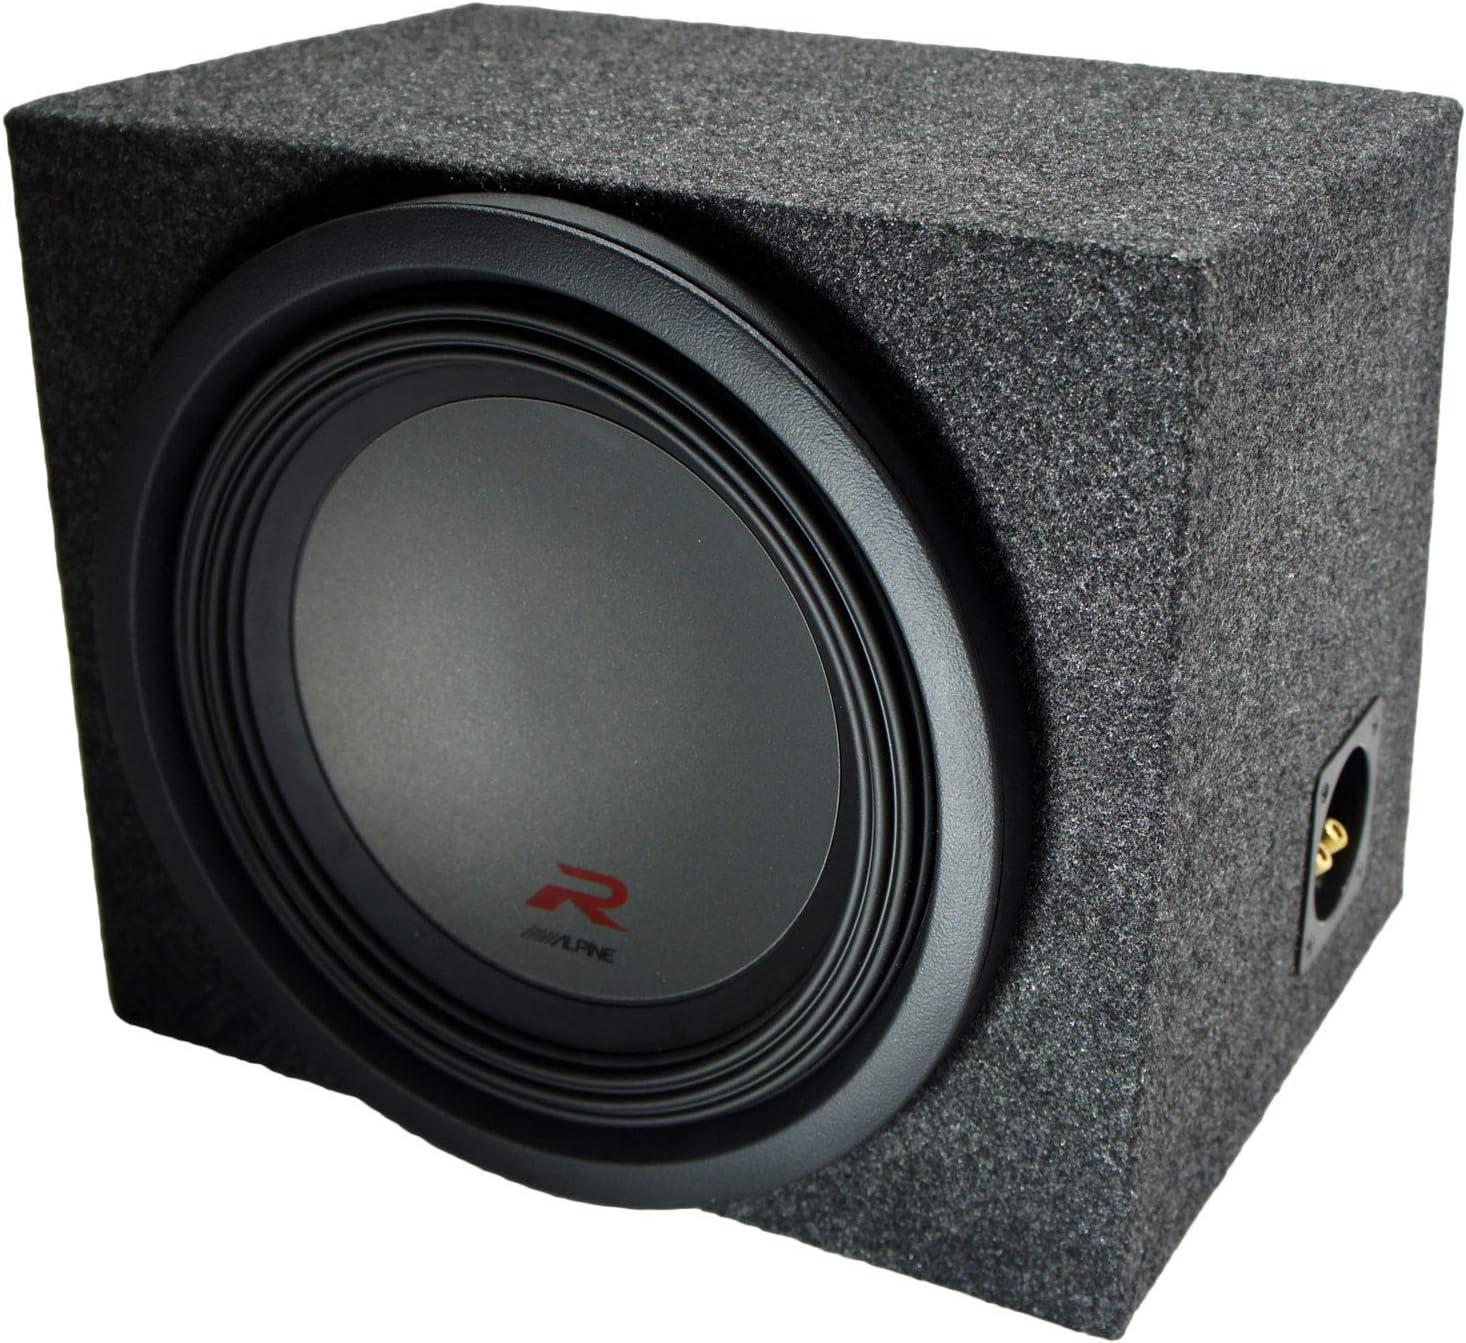 Universal Car Stereo Rearfire Sealed Single 10 Alpine R-W10D4 Type R Car Audio Subwoofer Custom Sub Box Enclosure Package